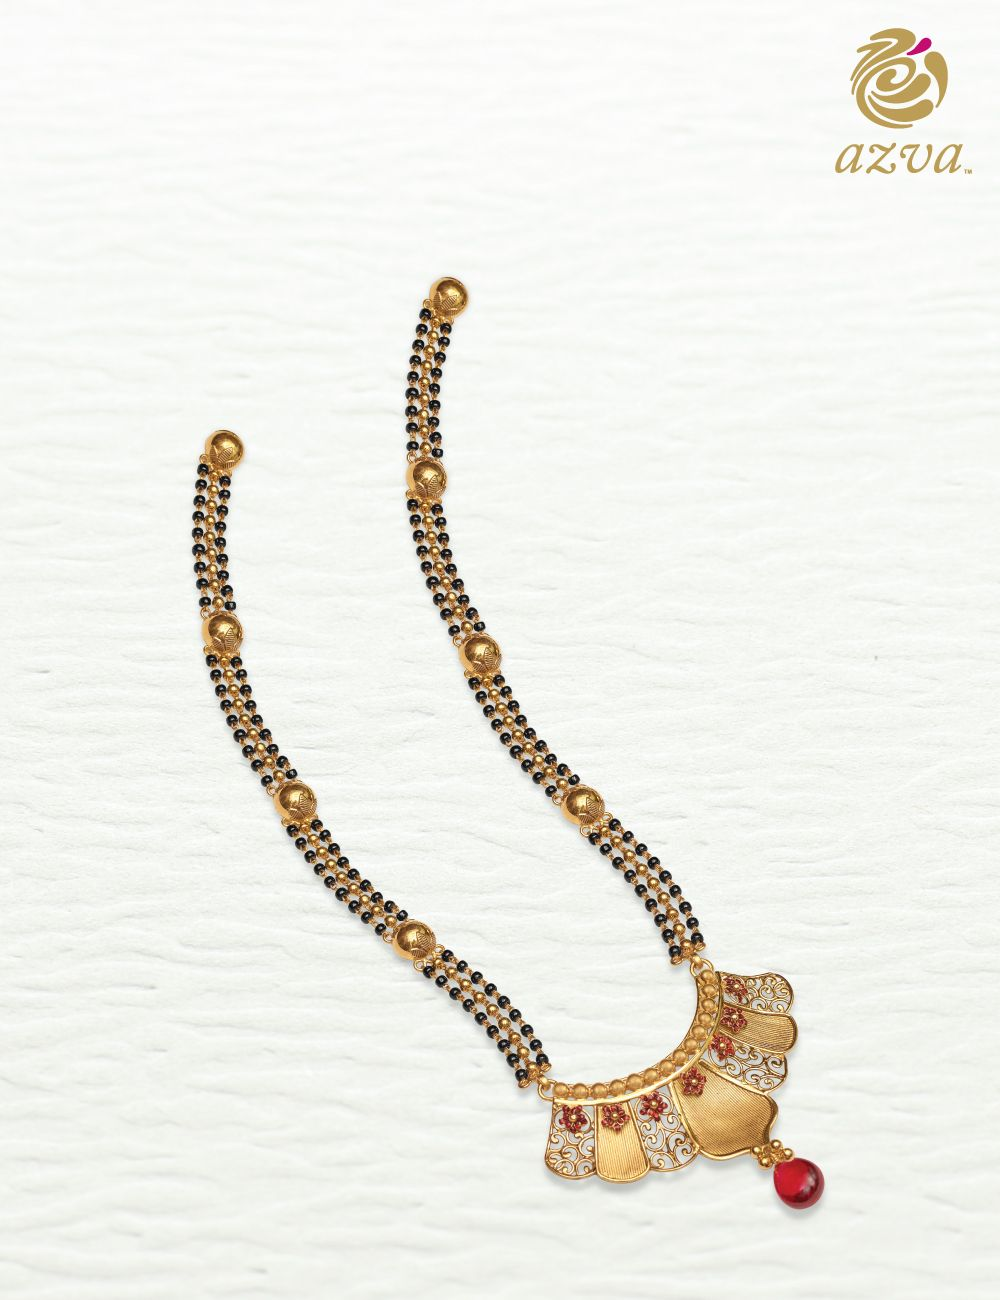 Azva gold mangalsutra of seven petals celebrate the wedding vows